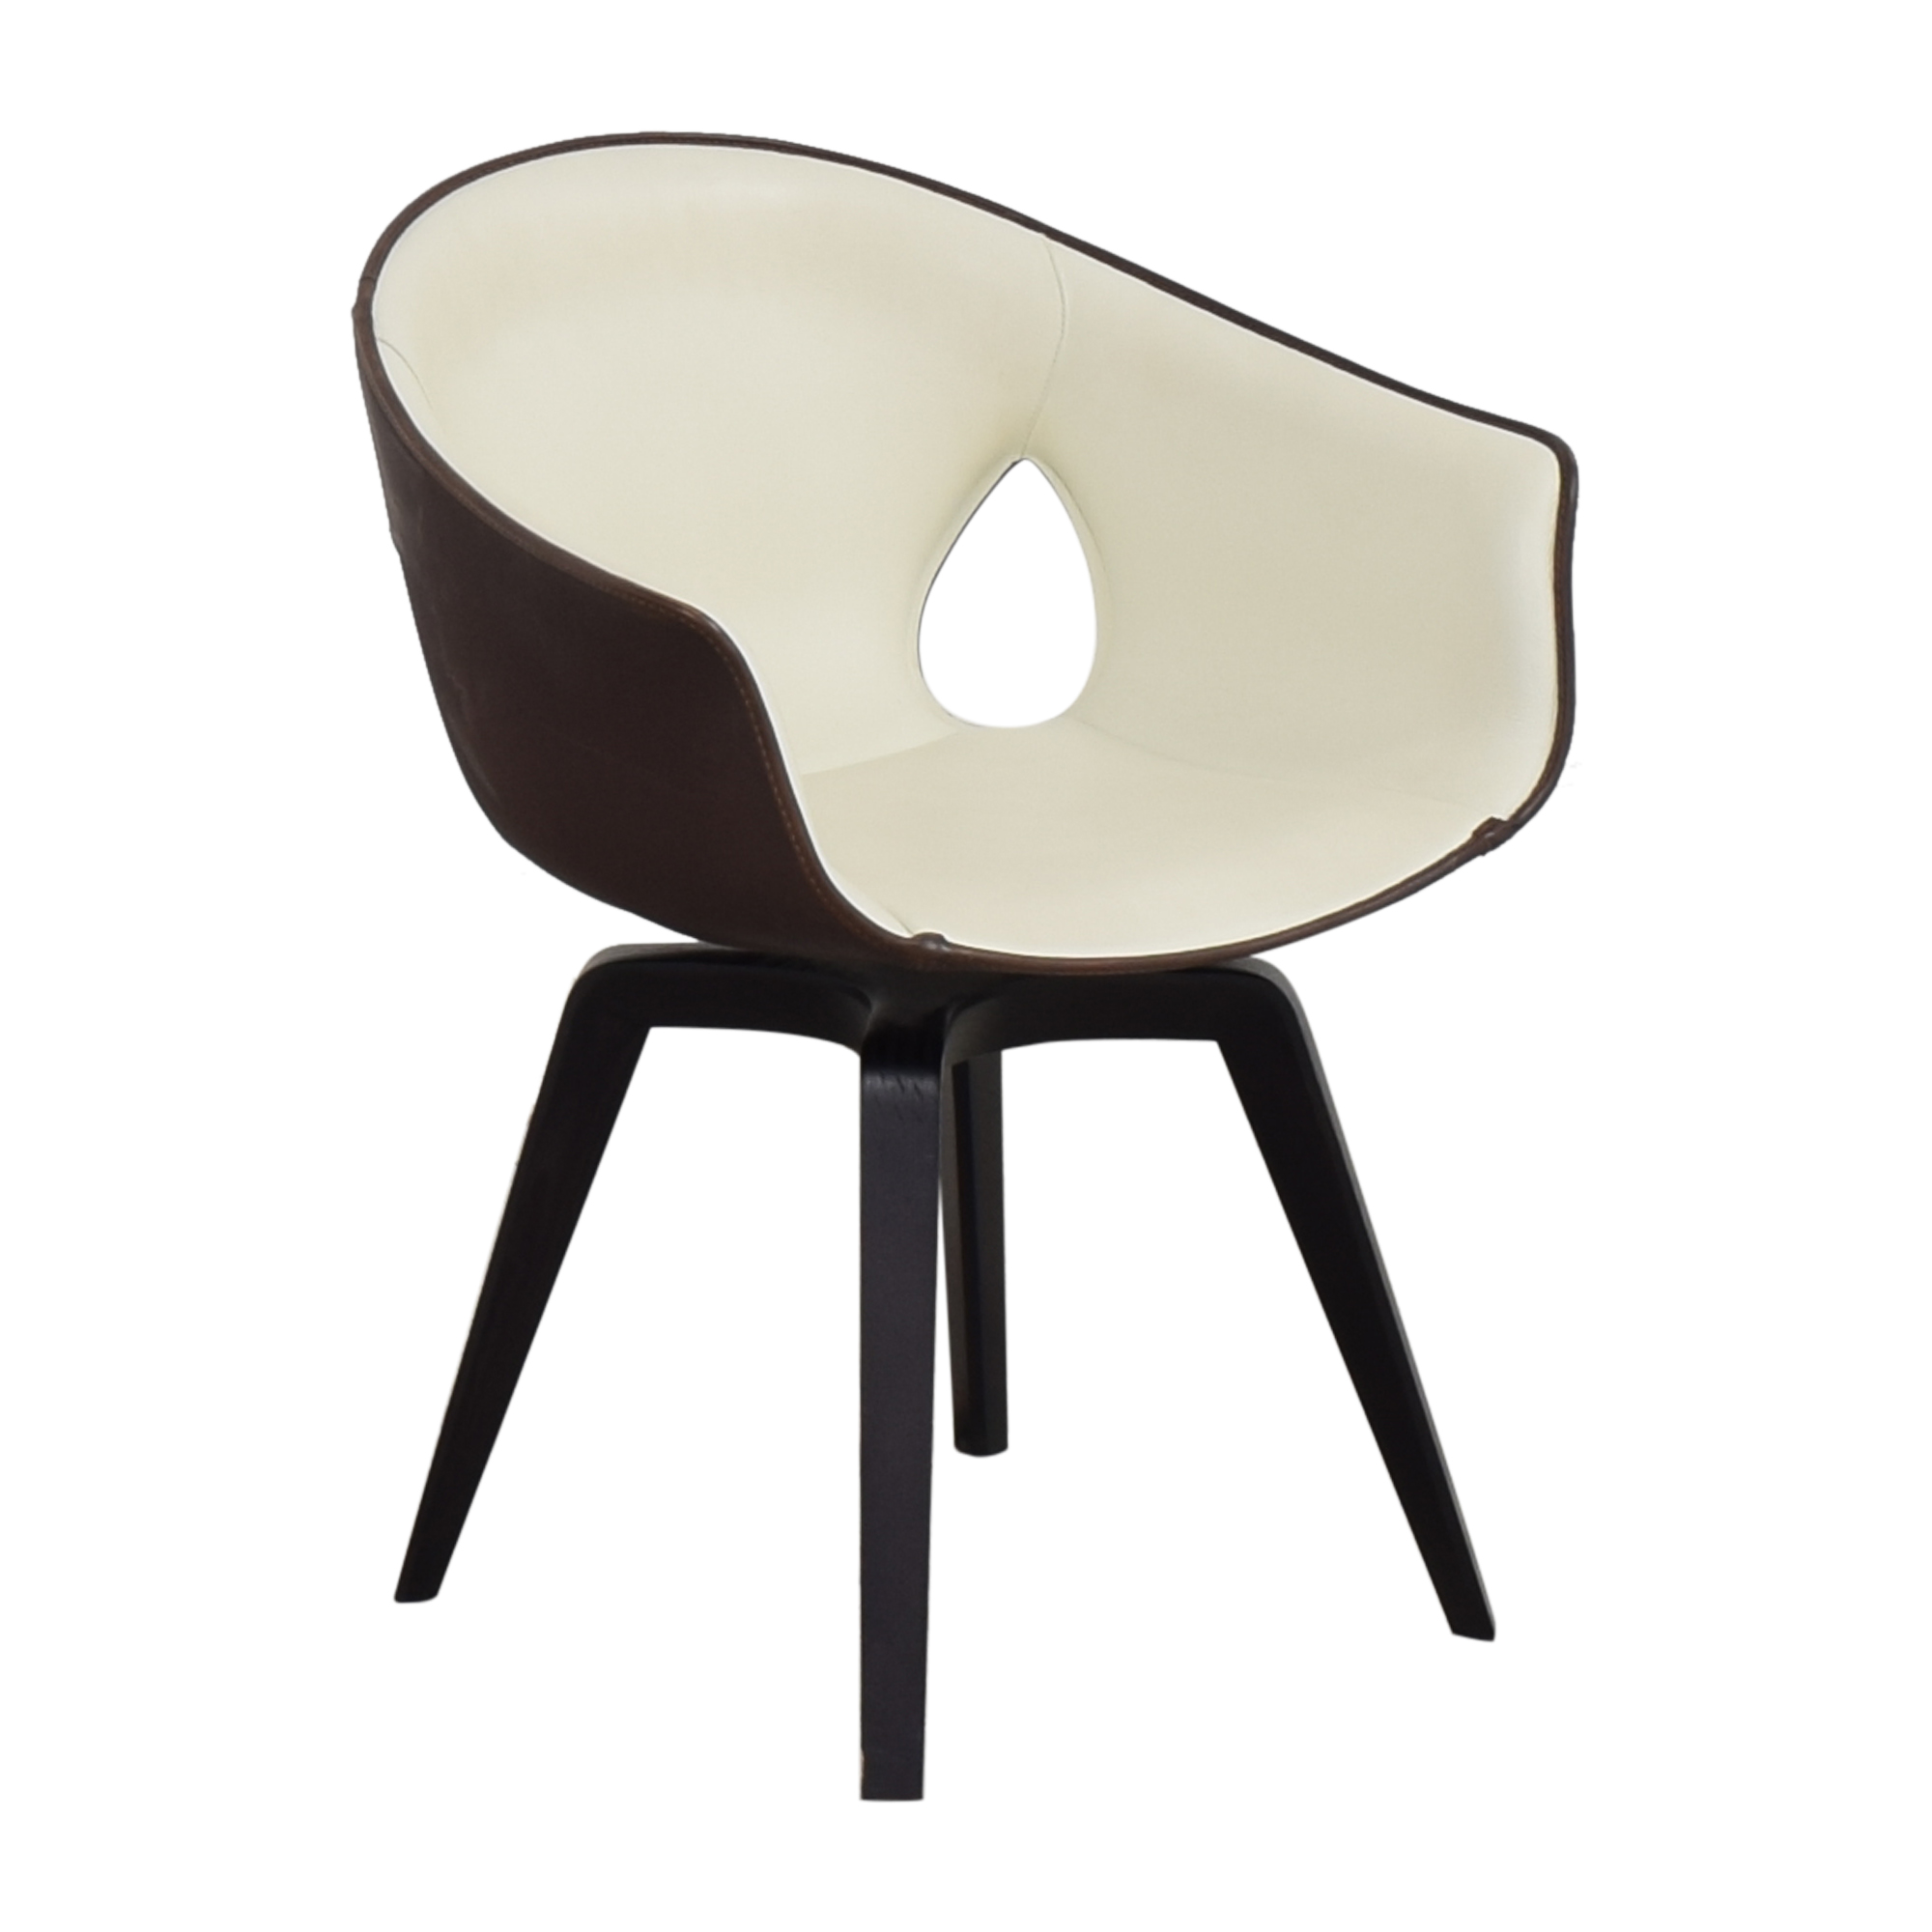 Poltrona Frau Poltrona Frau Ginger Side Chair discount